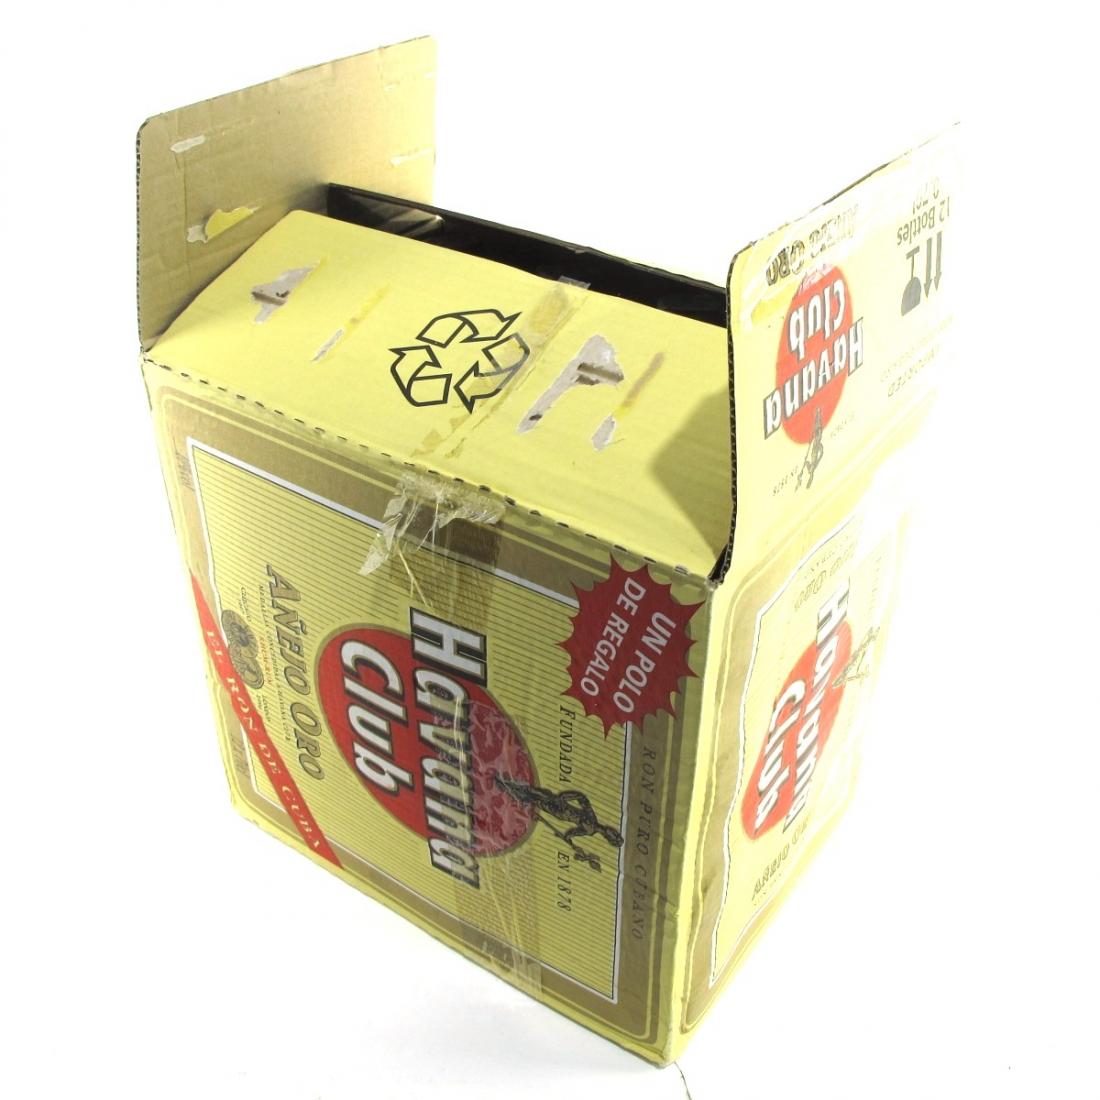 Havana Club Anejo Oro 12 x 70cl / Case